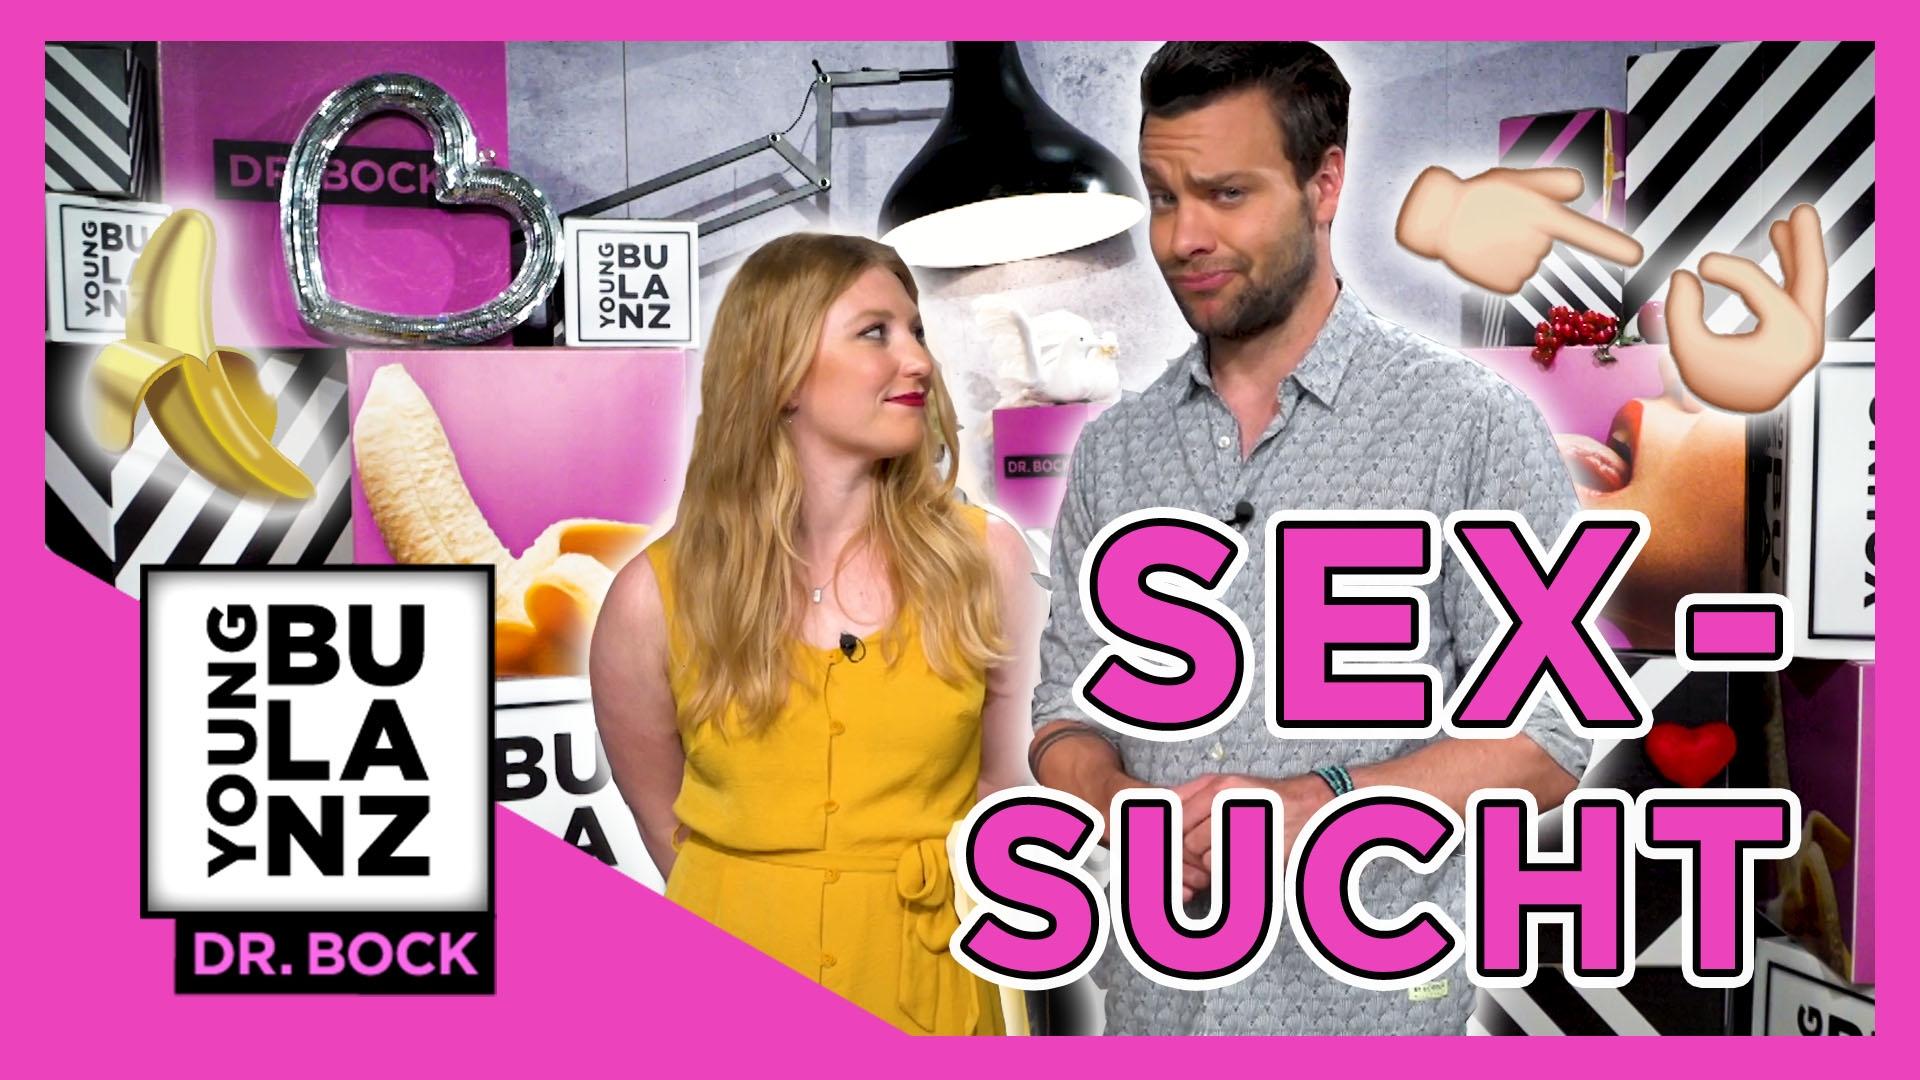 Sexsüchtiger Video